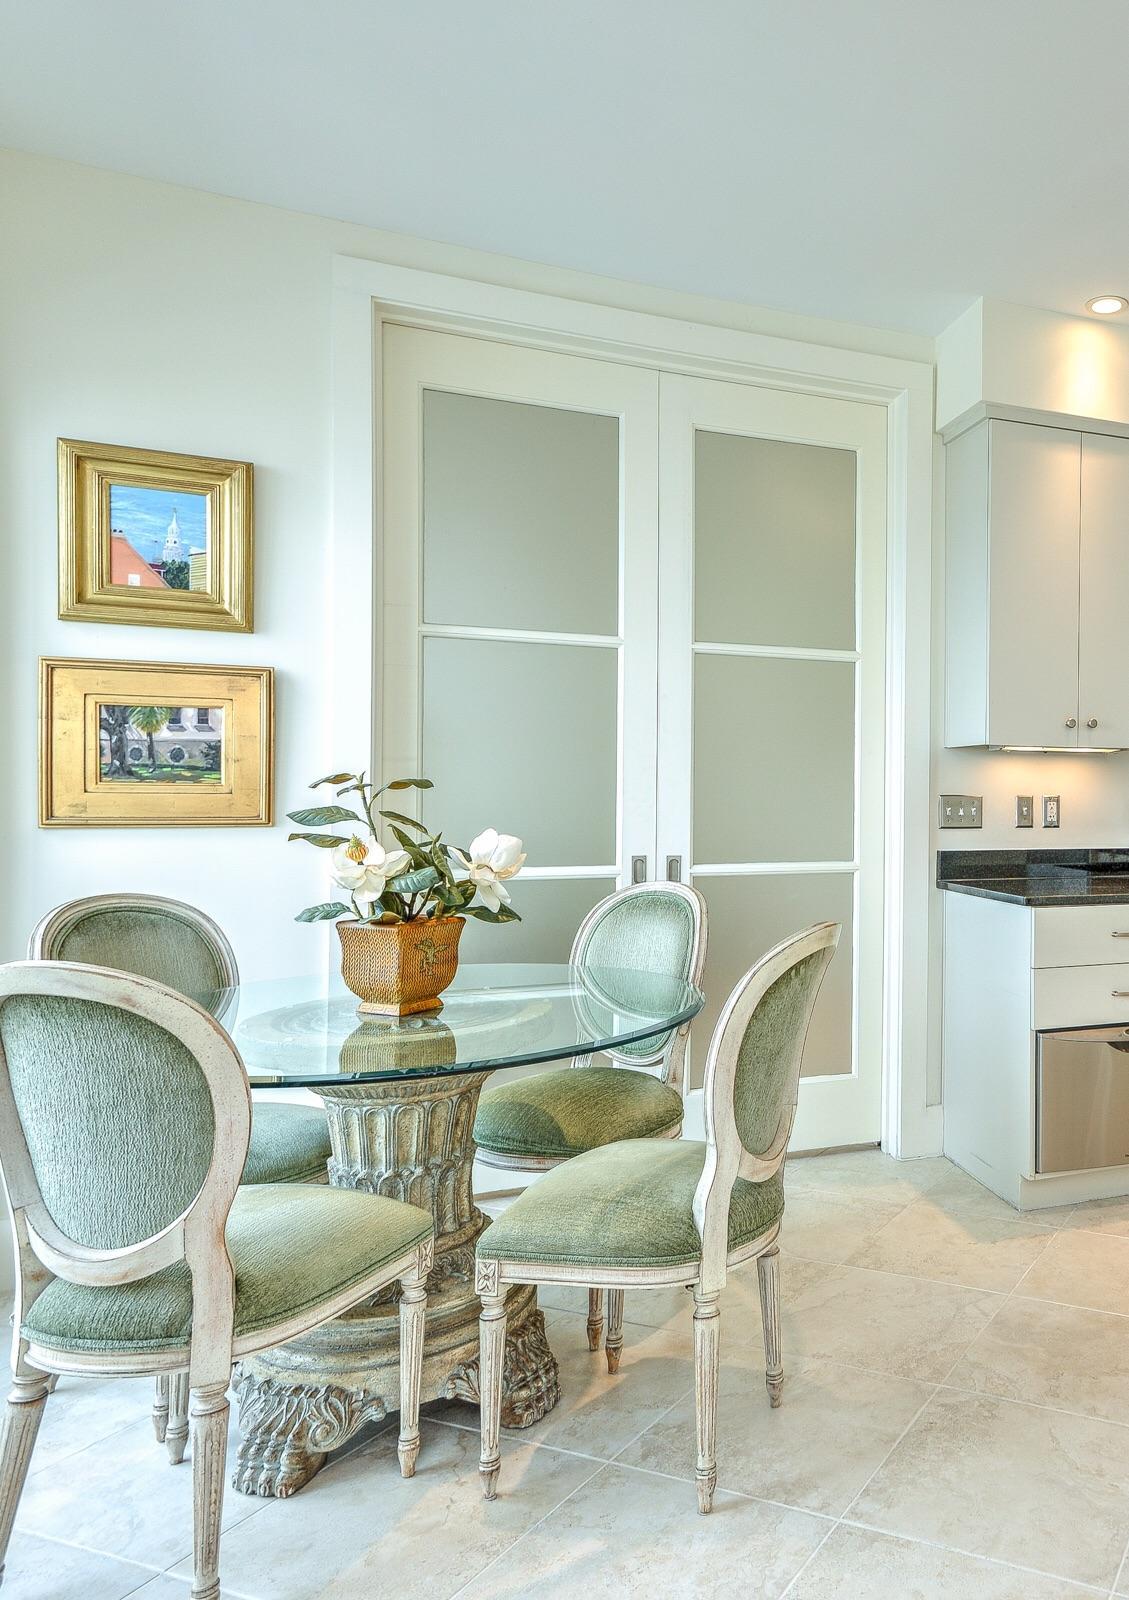 Fort Sumter House Homes For Sale - 1 King, Charleston, SC - 6